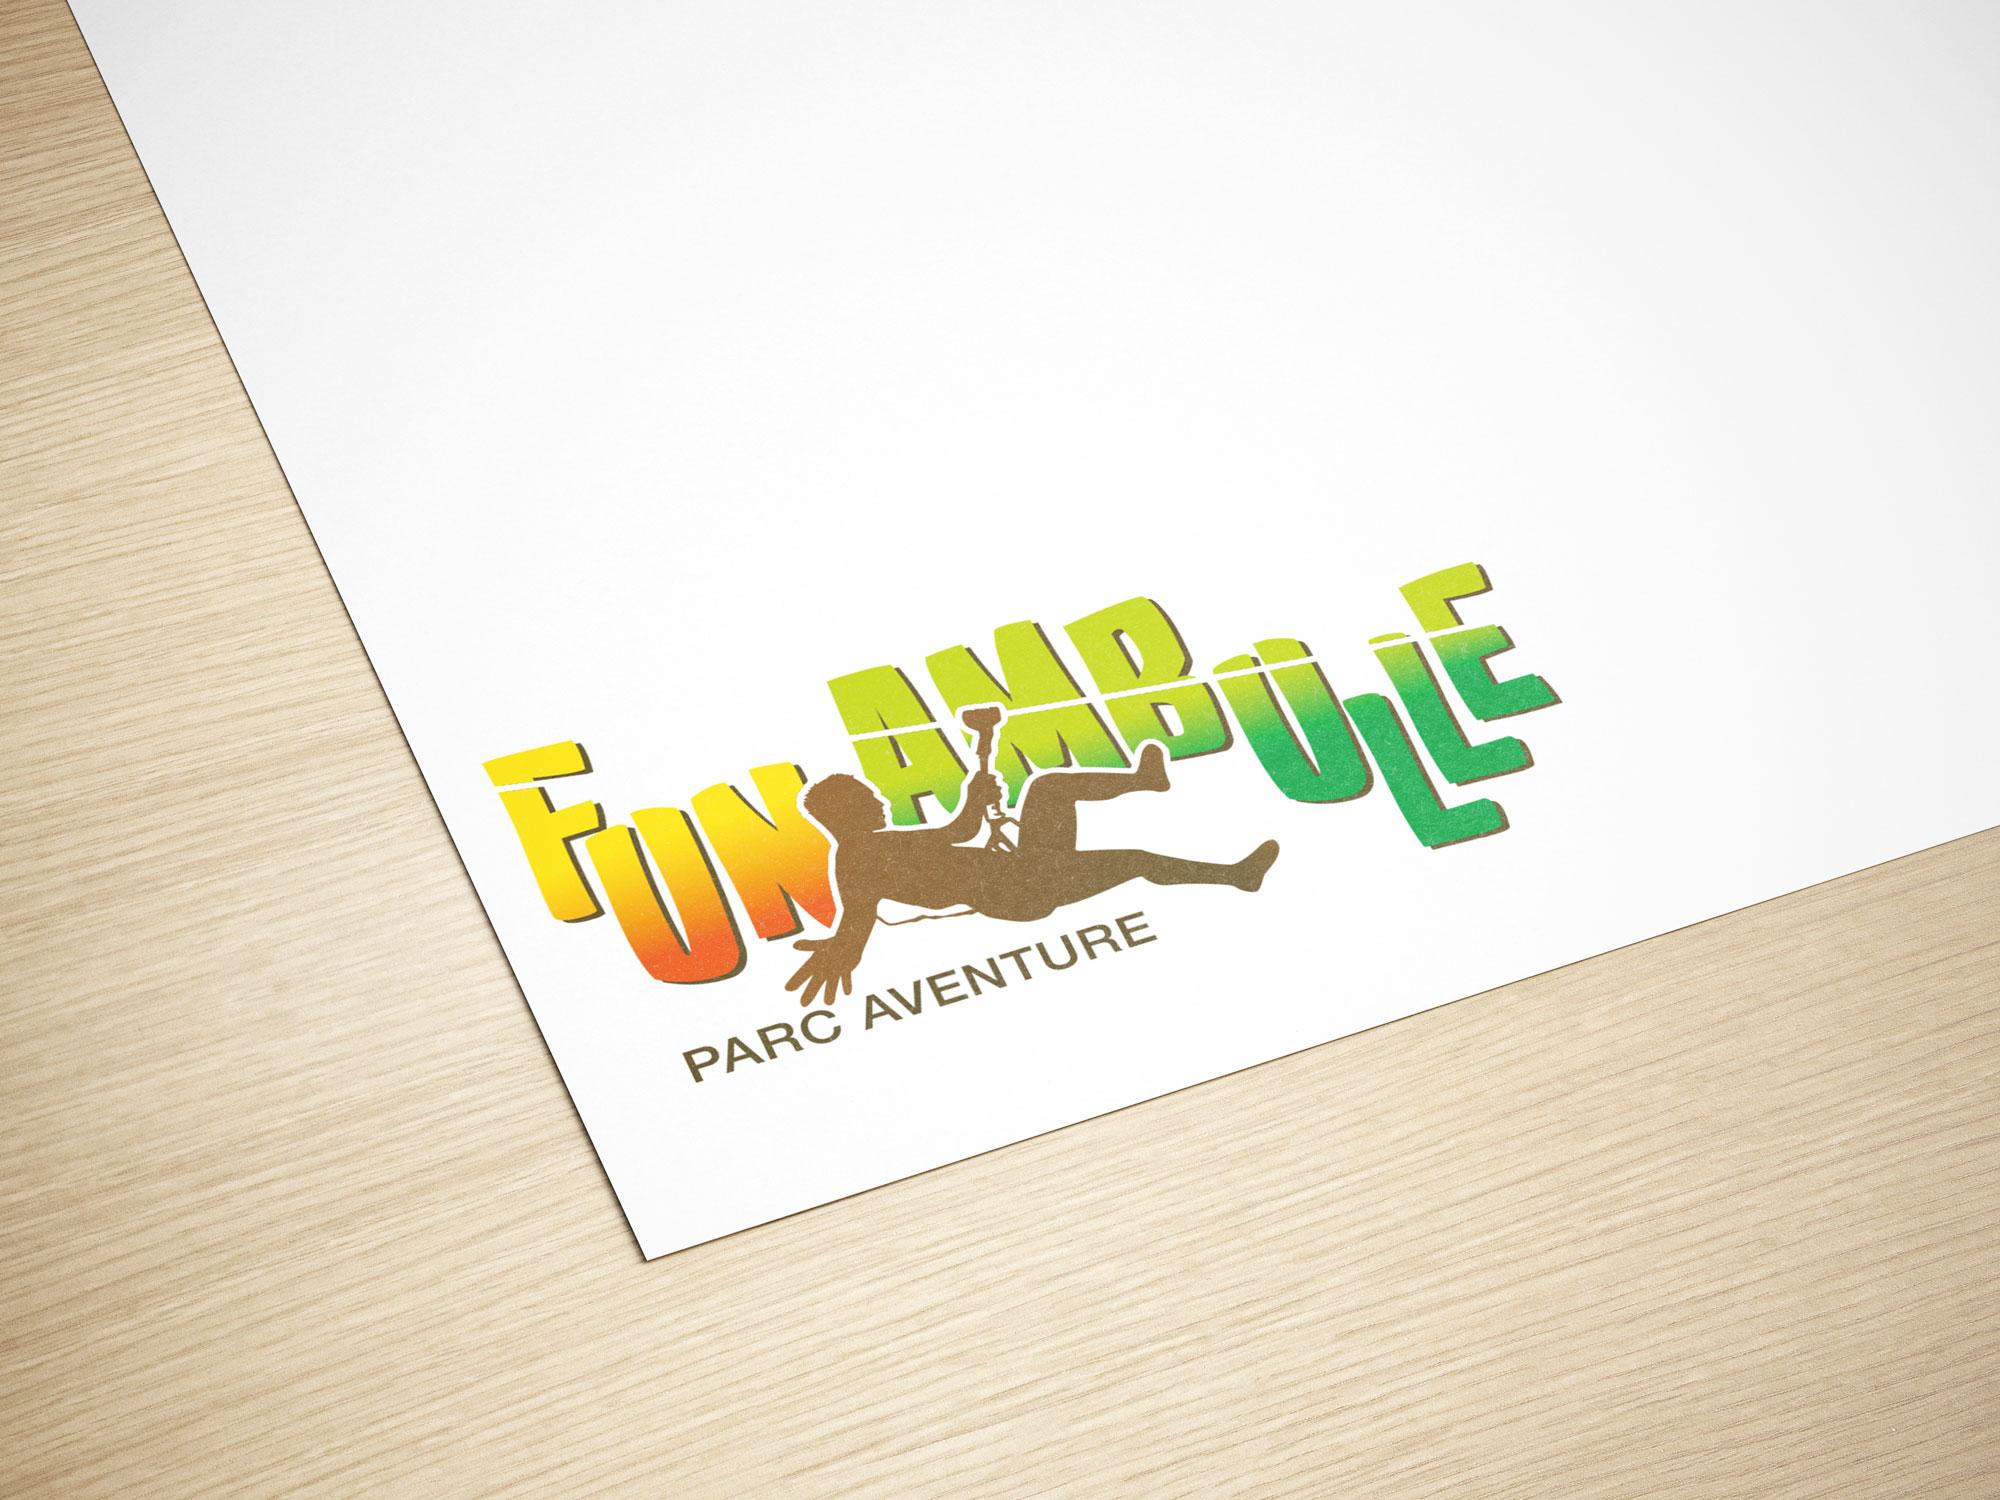 logotype Funambulle